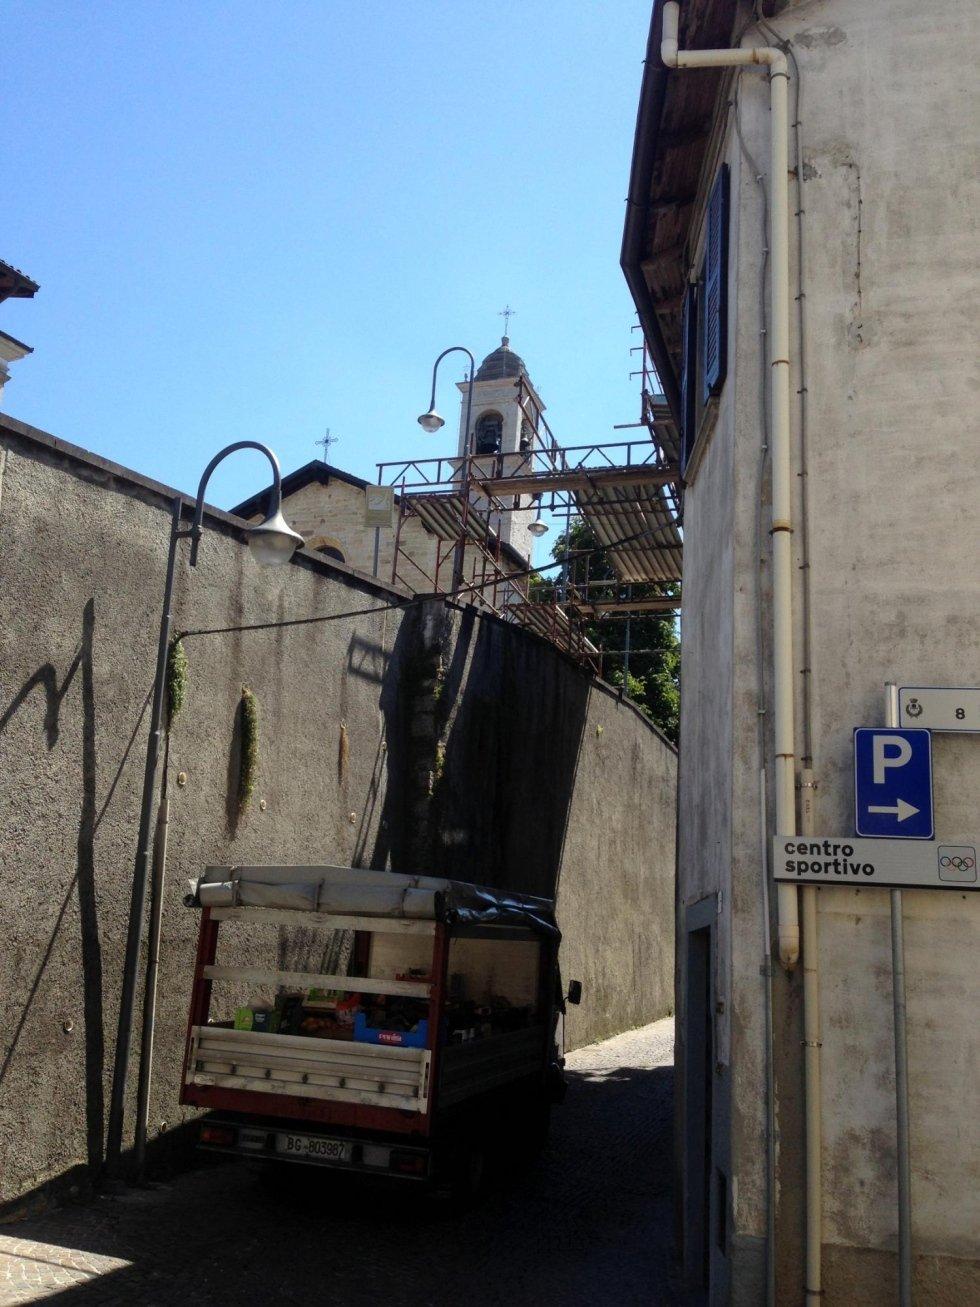 Nord Ponteggi - Ponteggio in sospensione